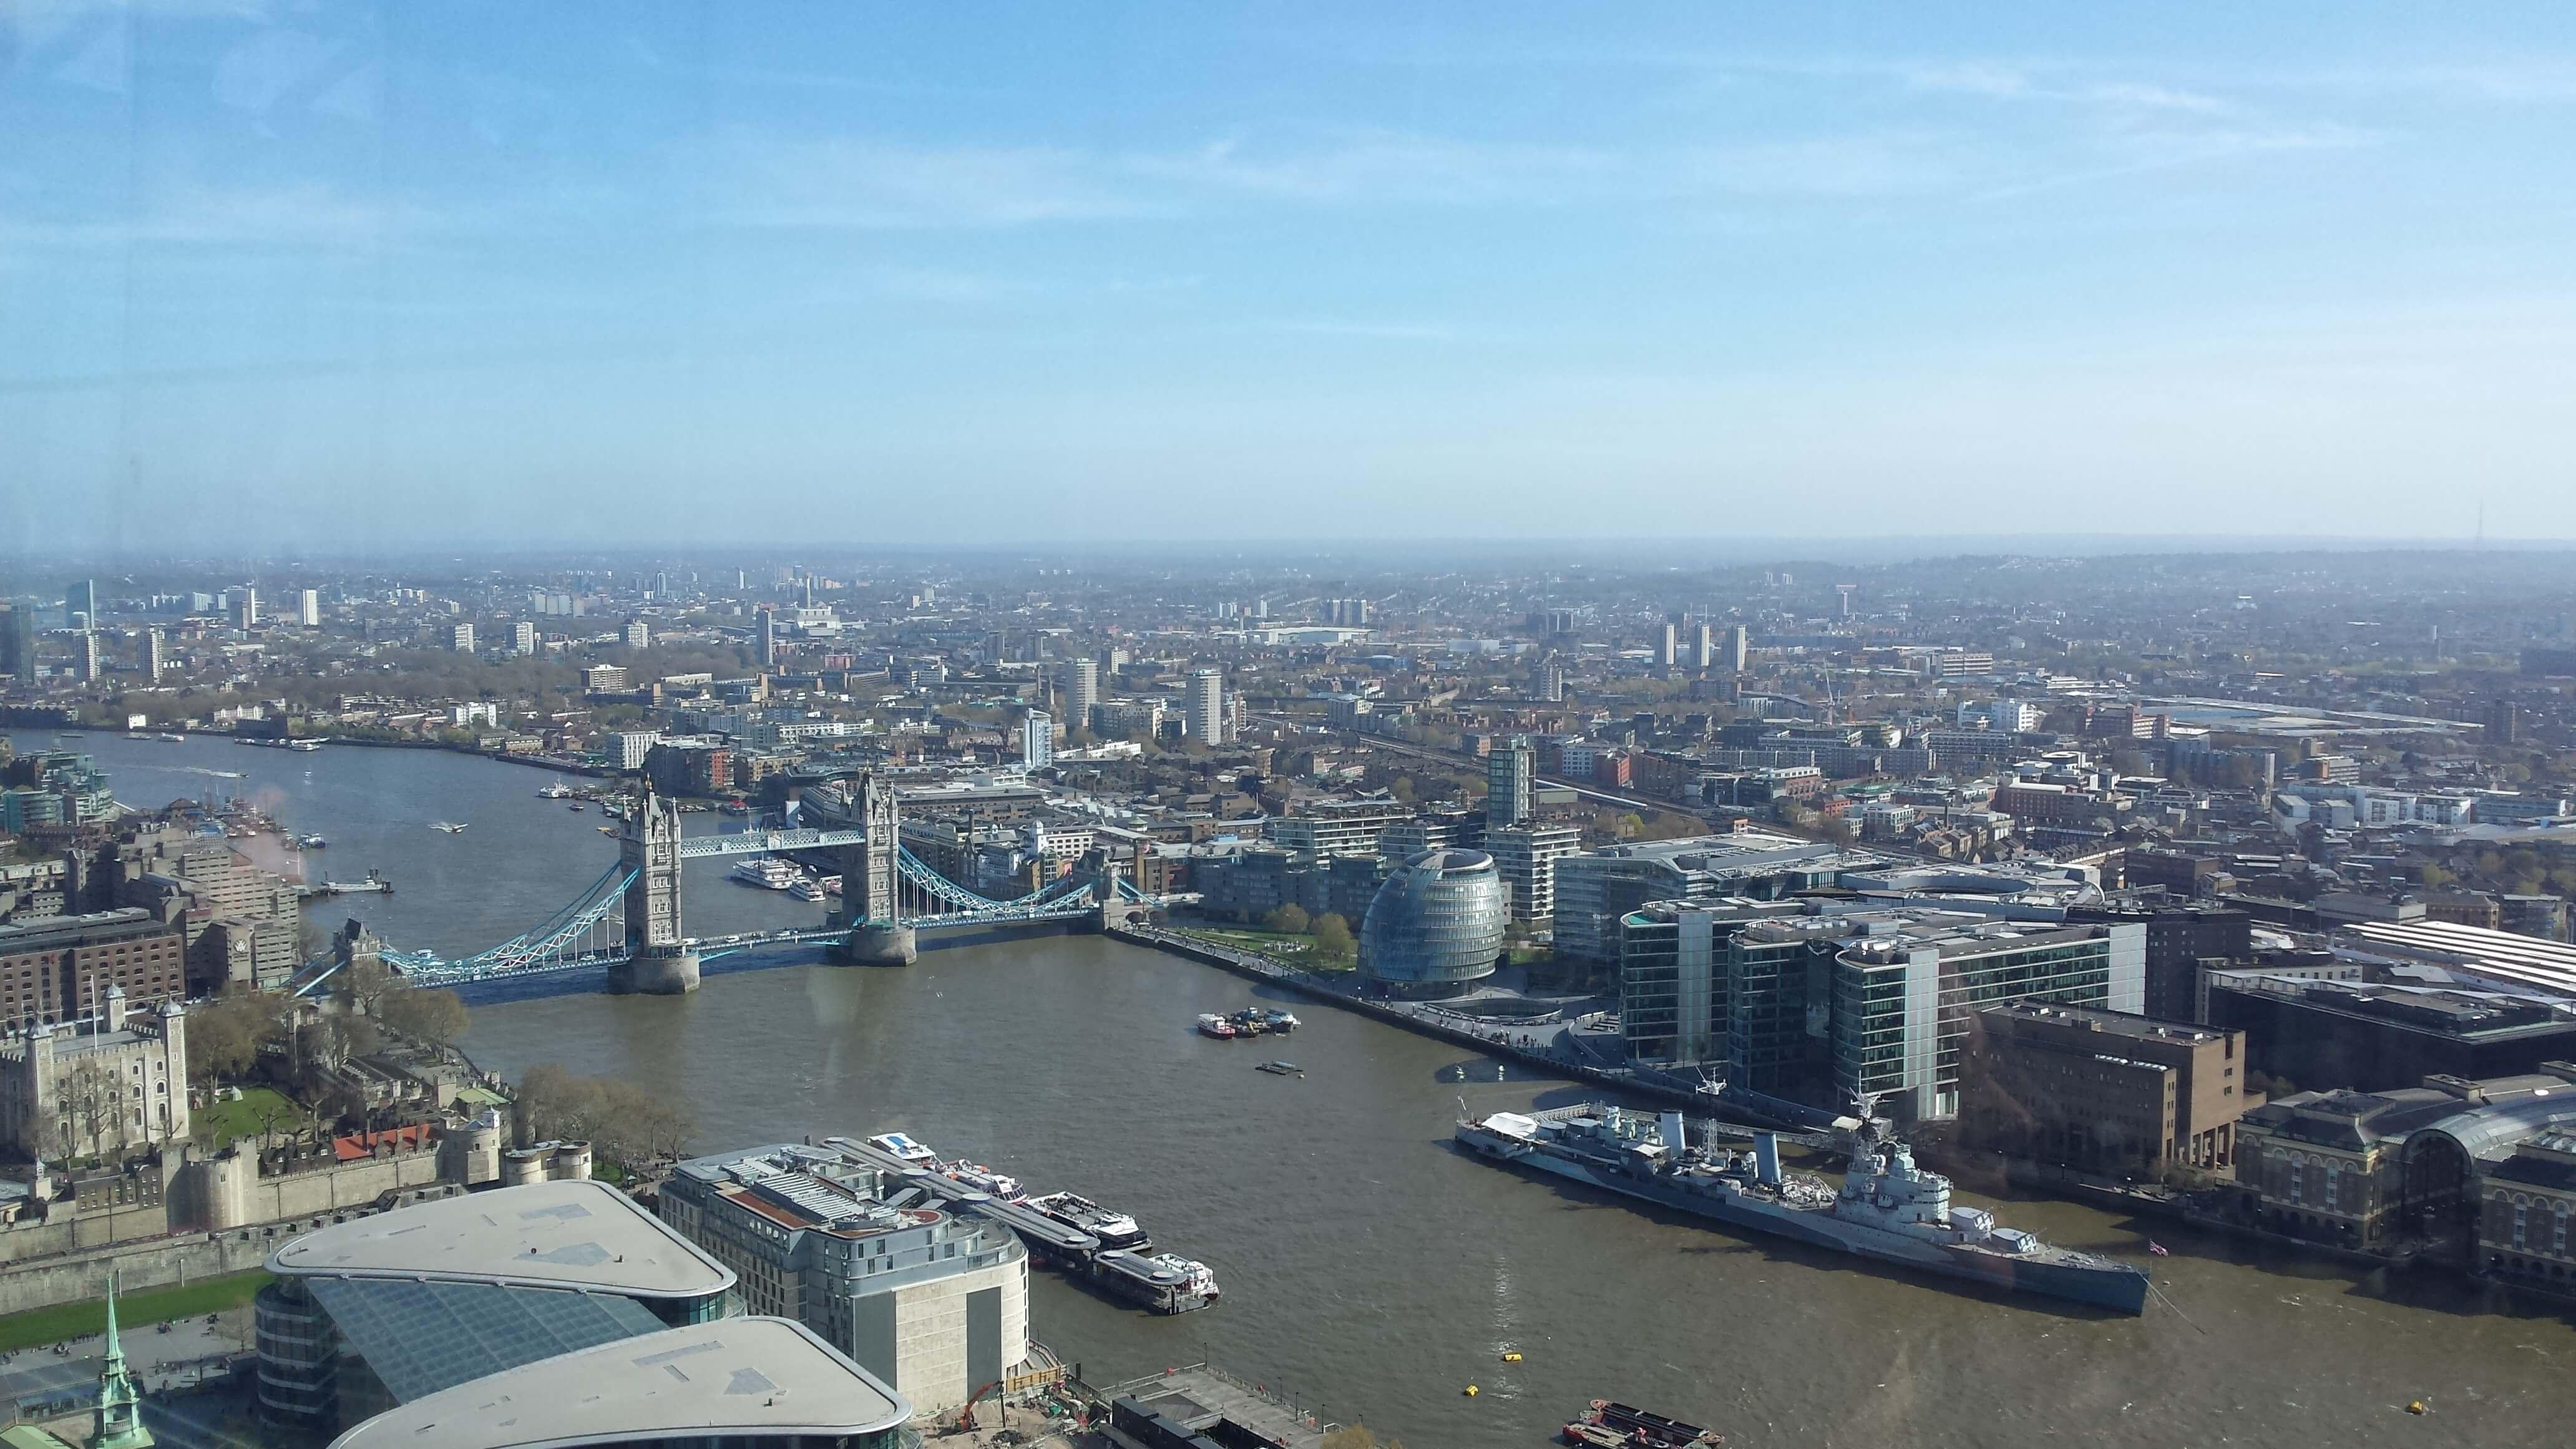 Some people call this London Bridge.